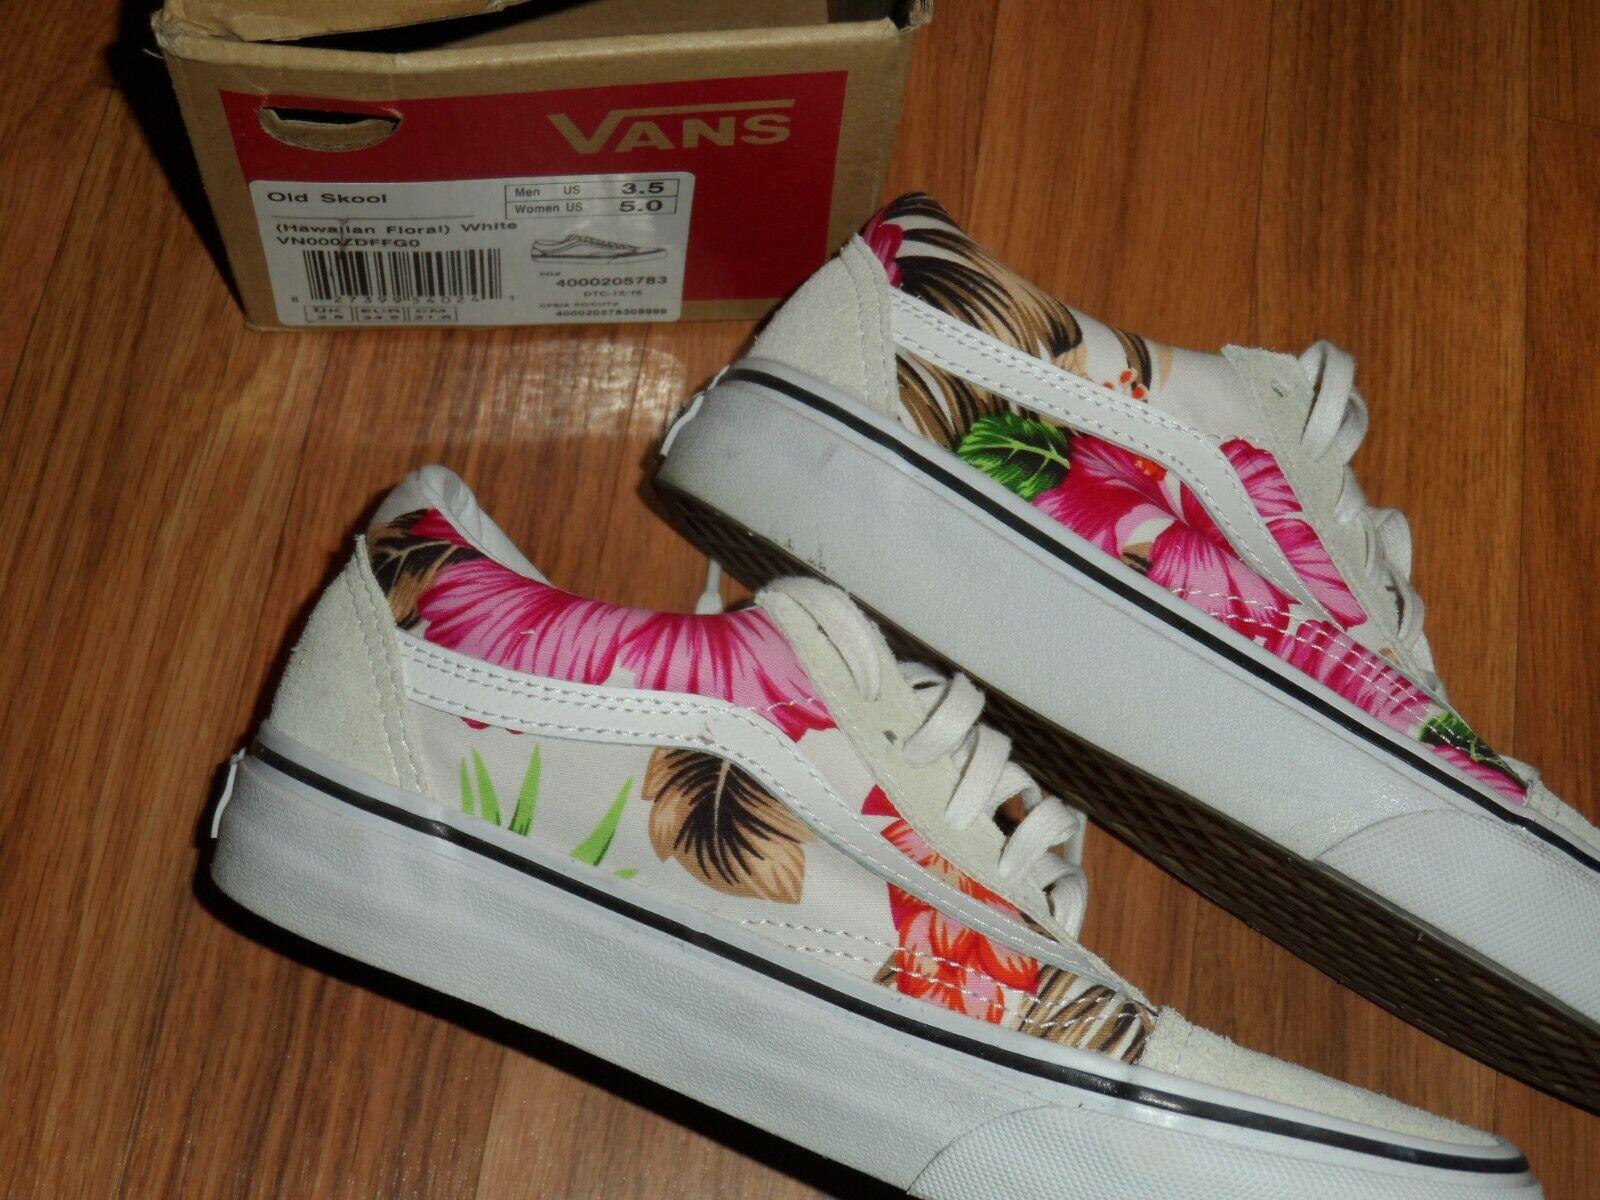 Hommes Jeunes Garçon Fille 3.5 femmes 5  Old Skool Vans chaussures Tropical Hawaïen Floral